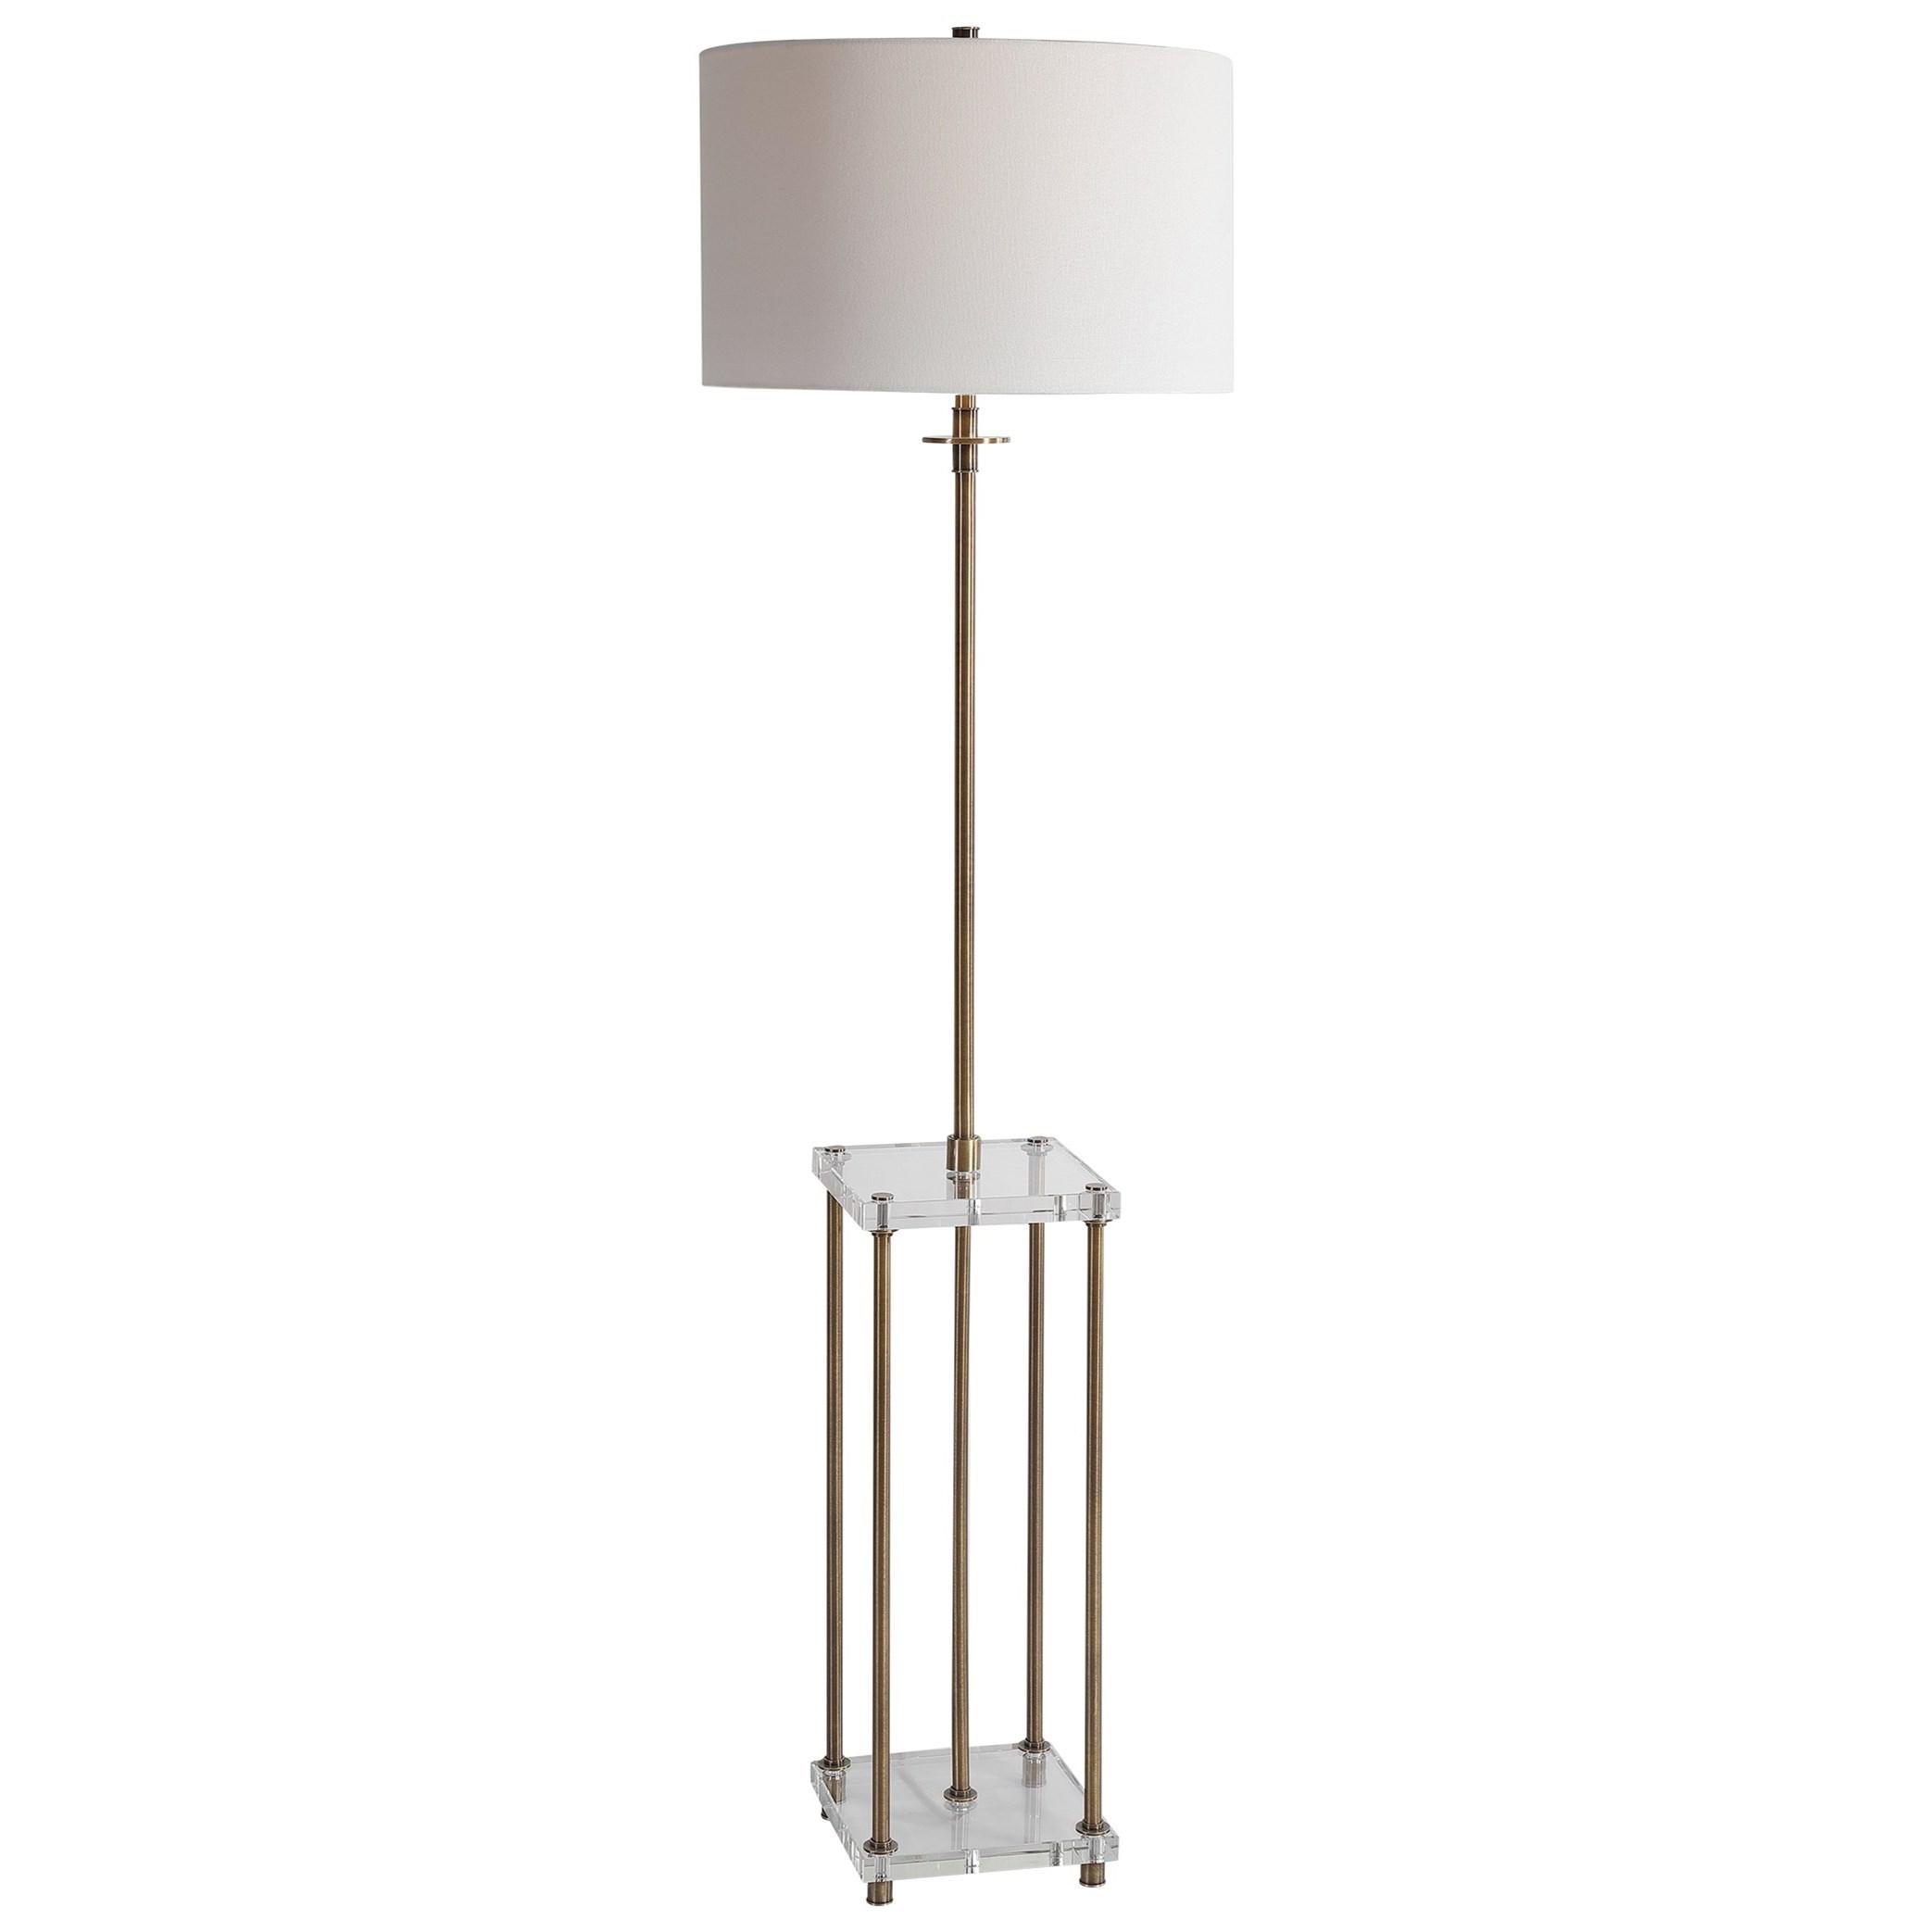 Floor Lamps Palladian Antique Brass Floor Lamp by Uttermost at Mueller Furniture